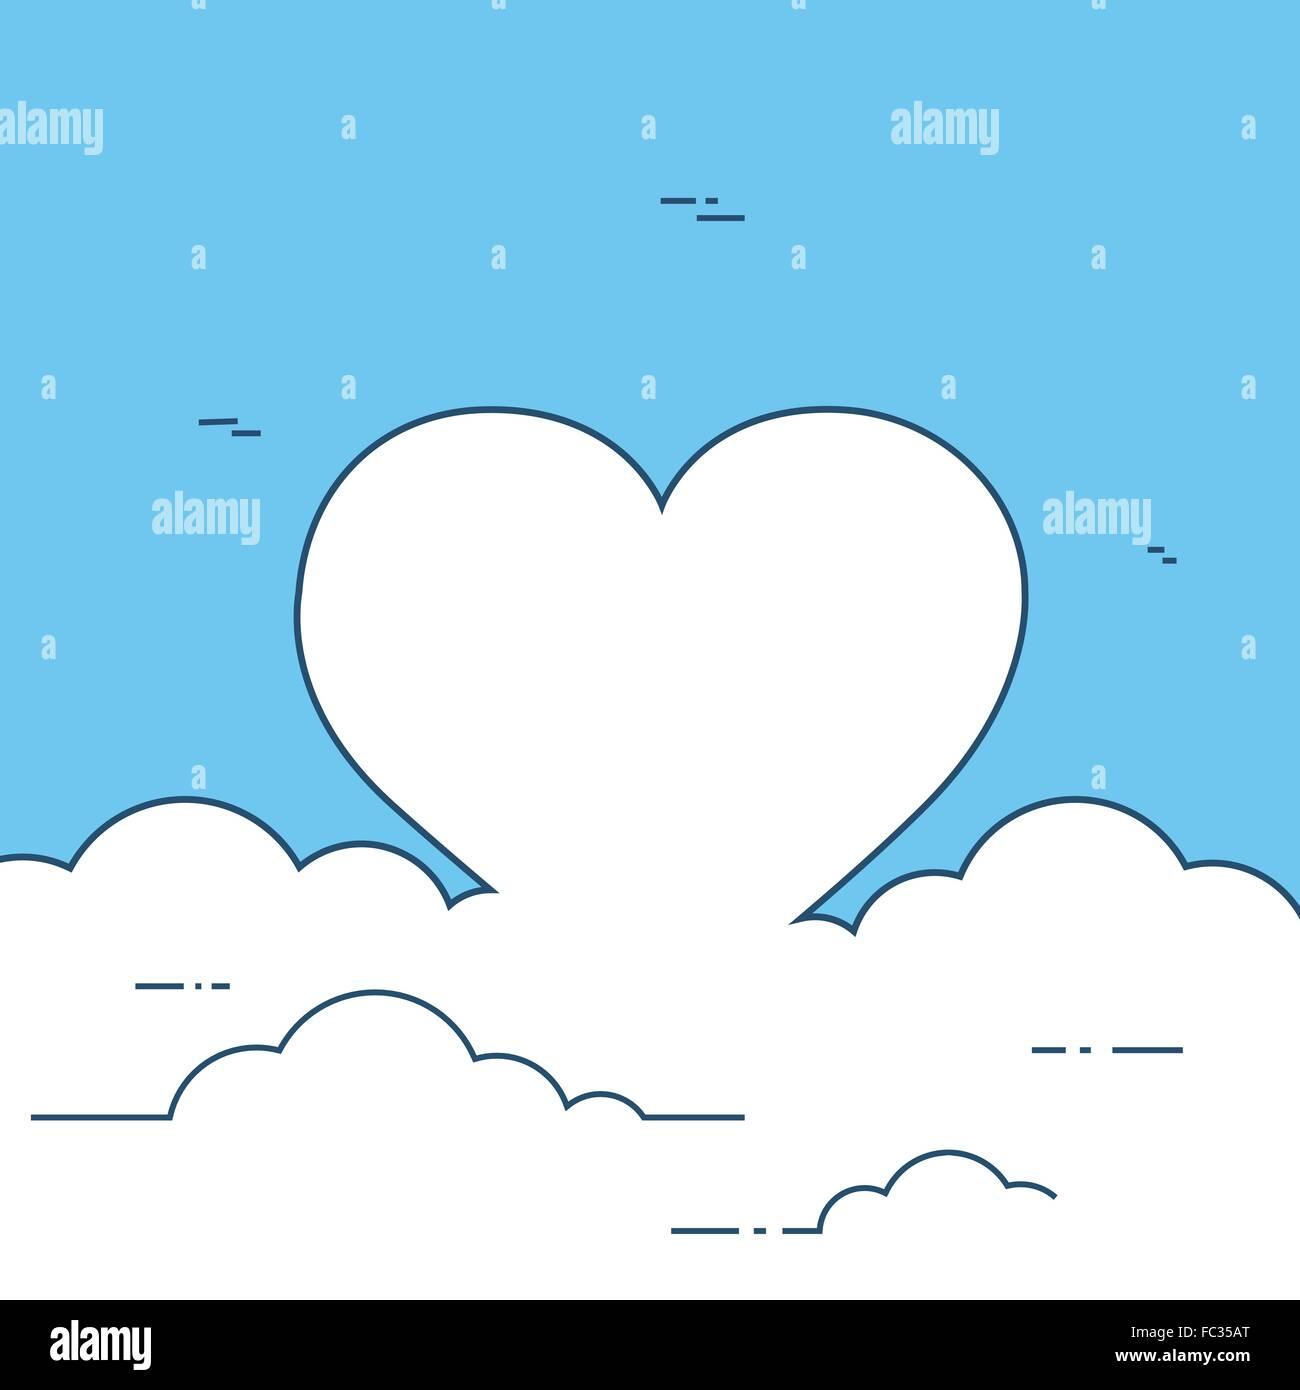 Heart Shape Frame Doodle White Cloud Background Stock Vector Art ...